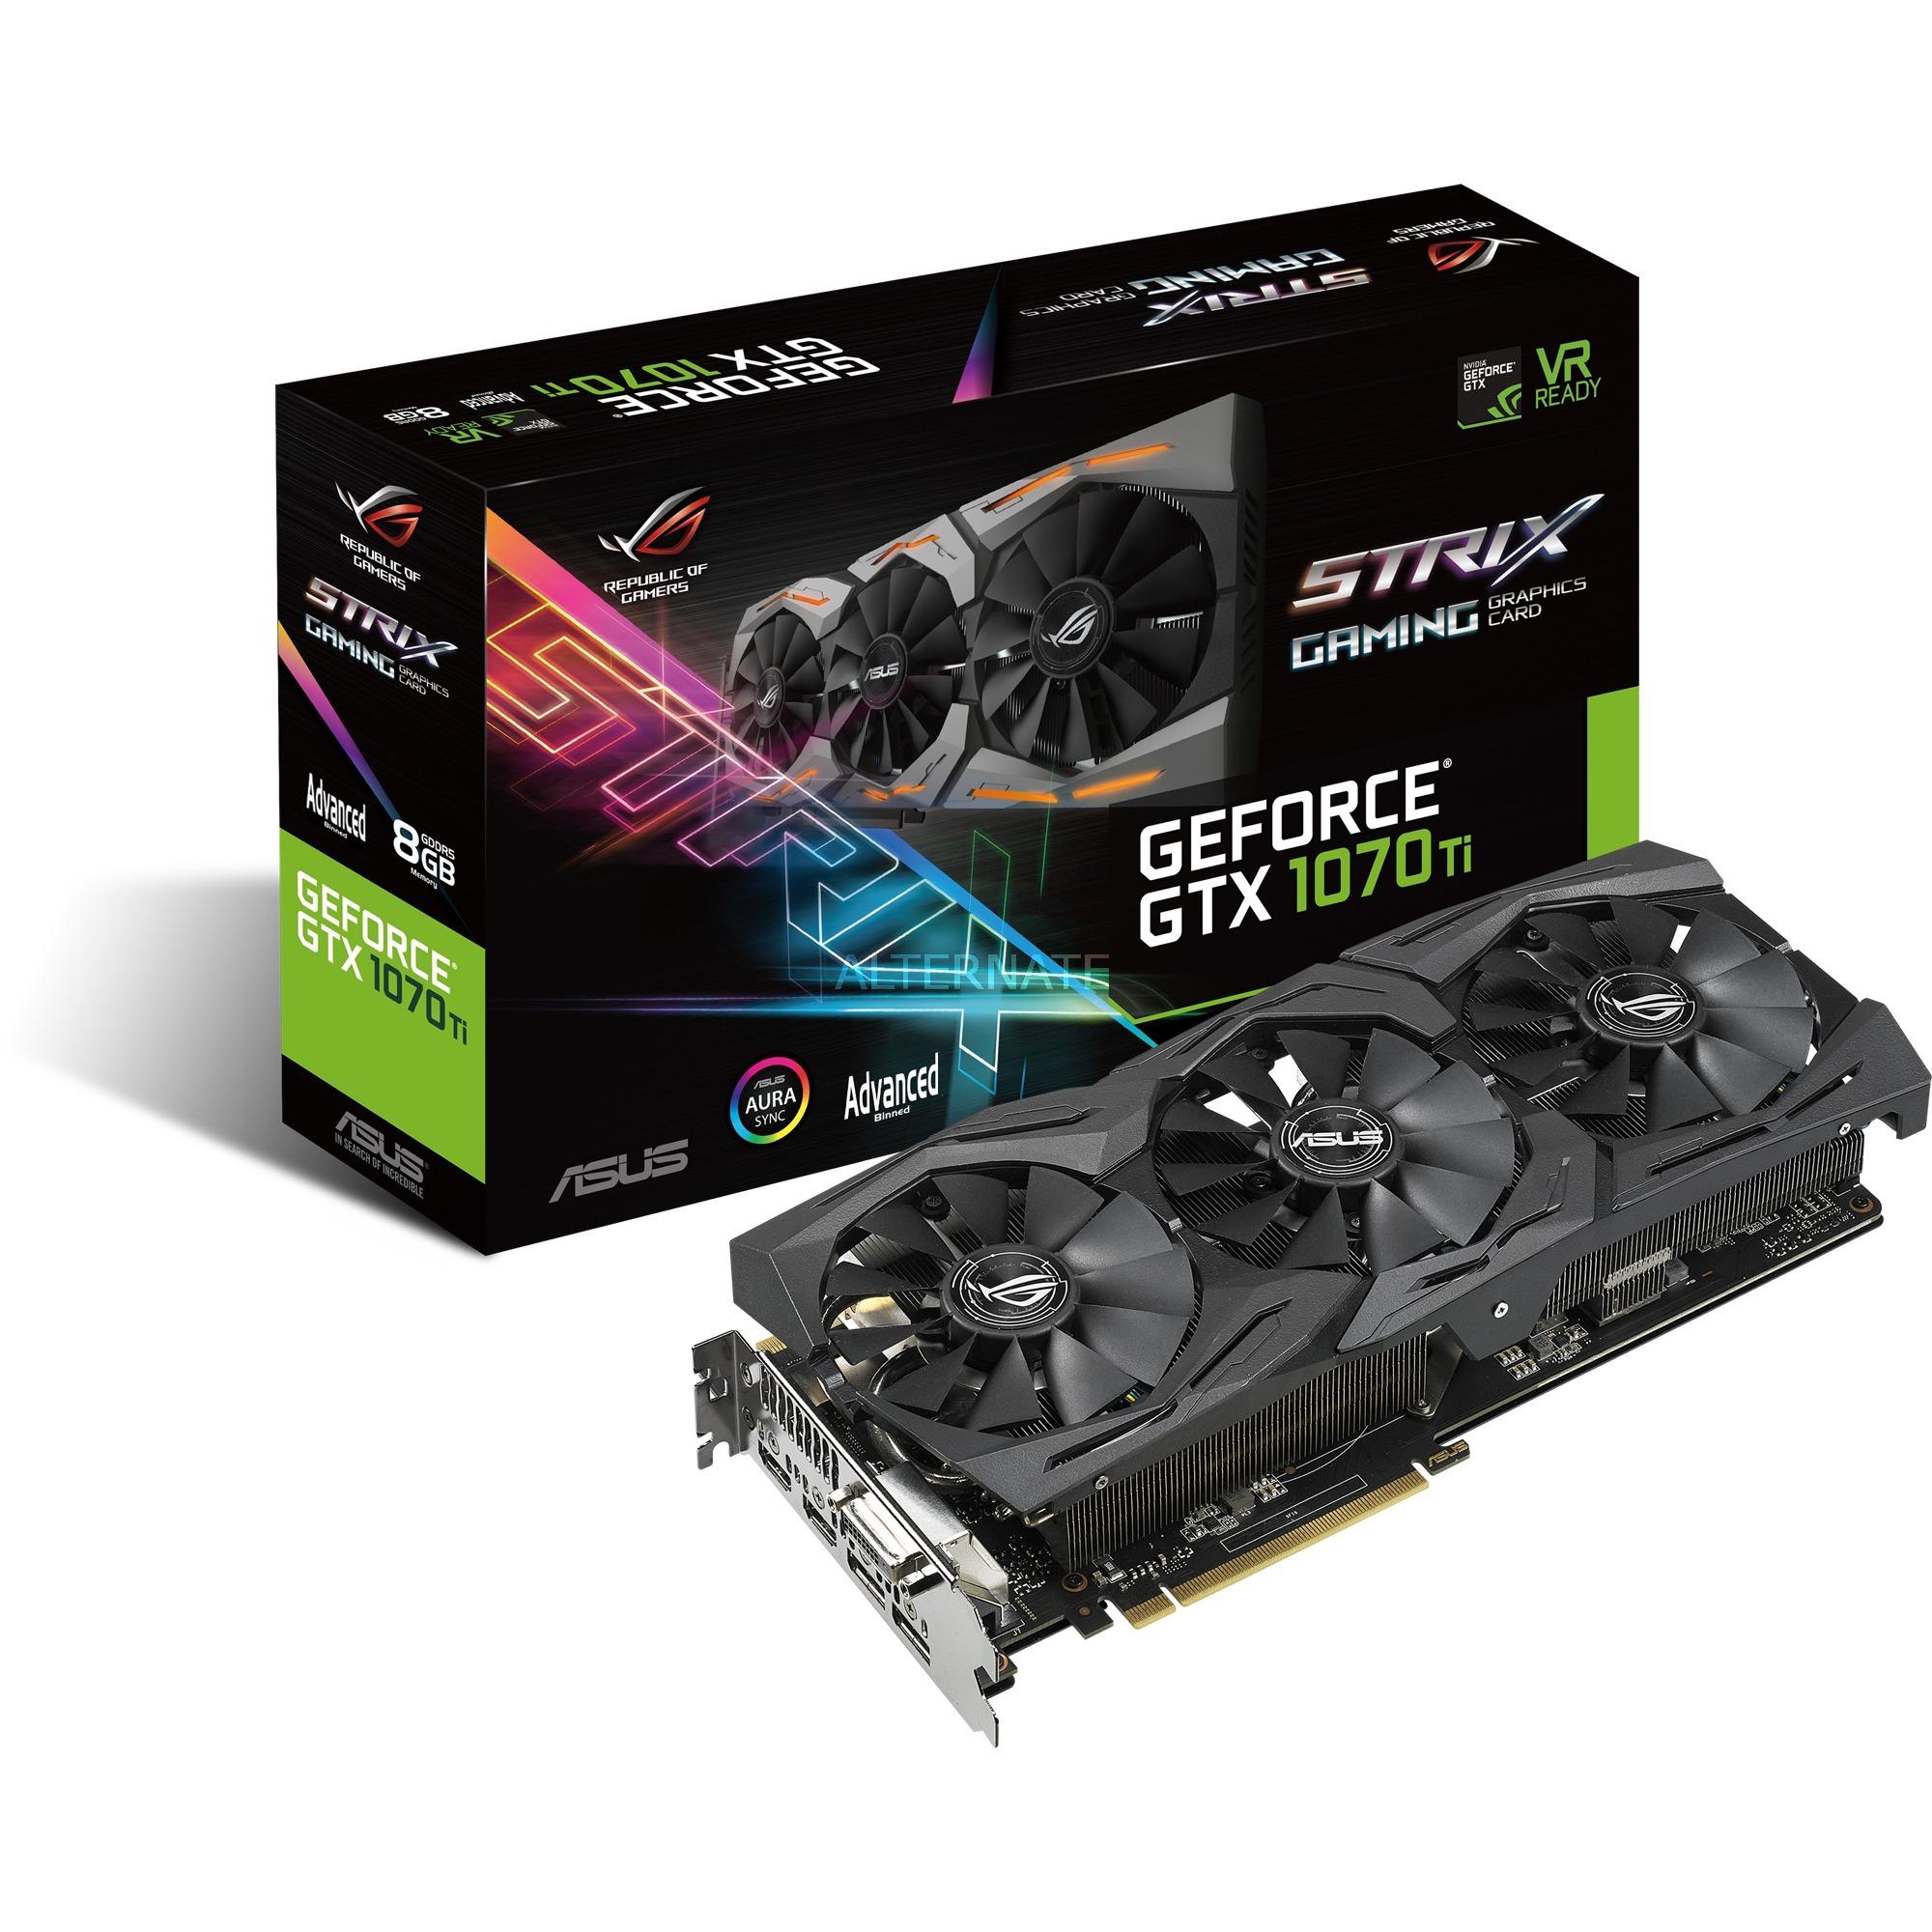 ROG STRIX GeForce GTX 1070 Ti GAMING Advanced, Carte graphique